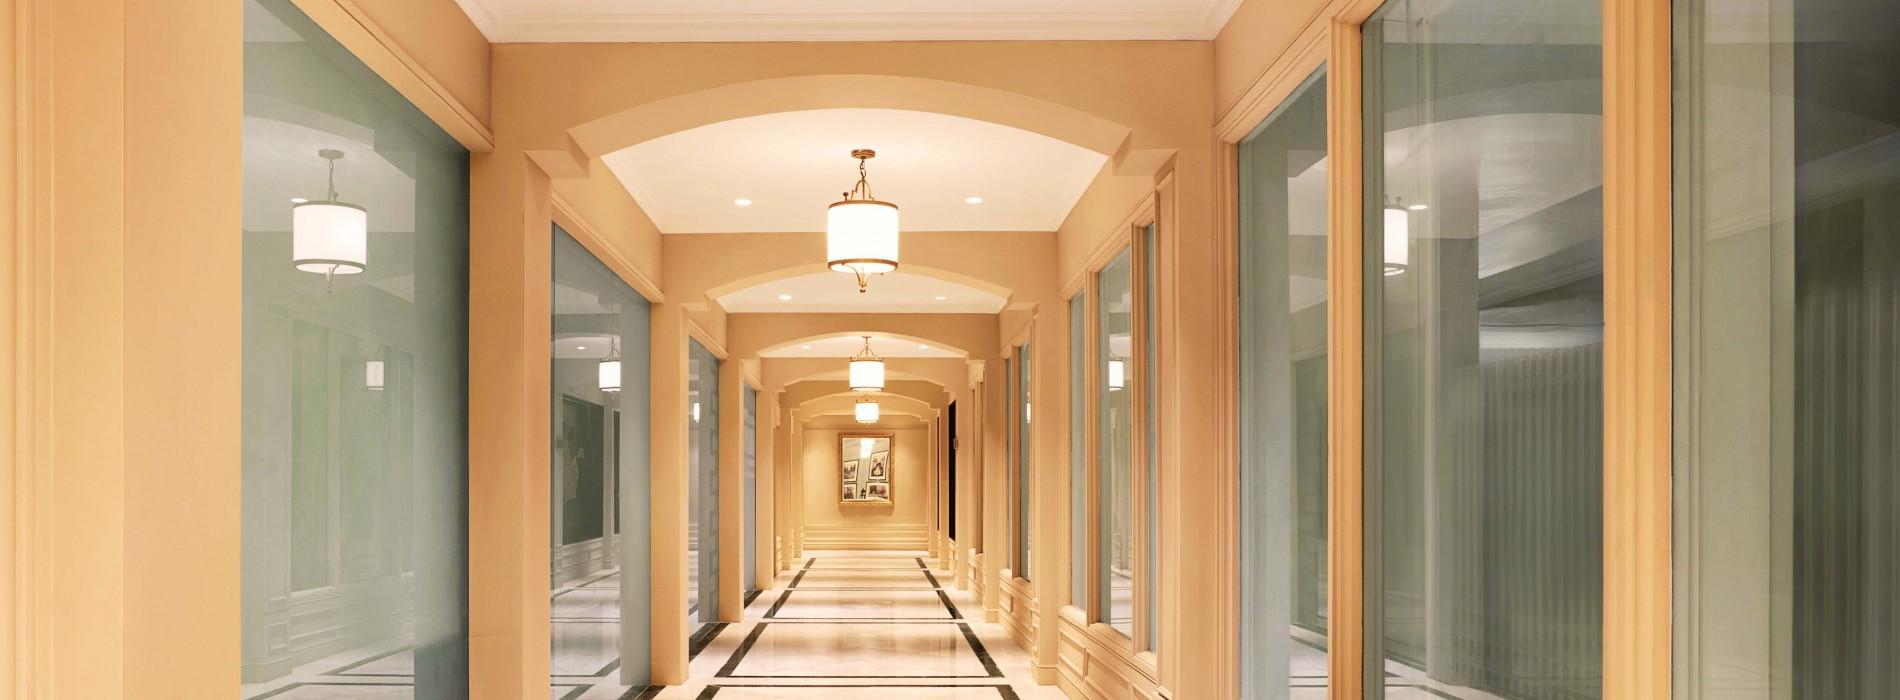 South India's oldest hotel Taj Connemara reopens in Chennai